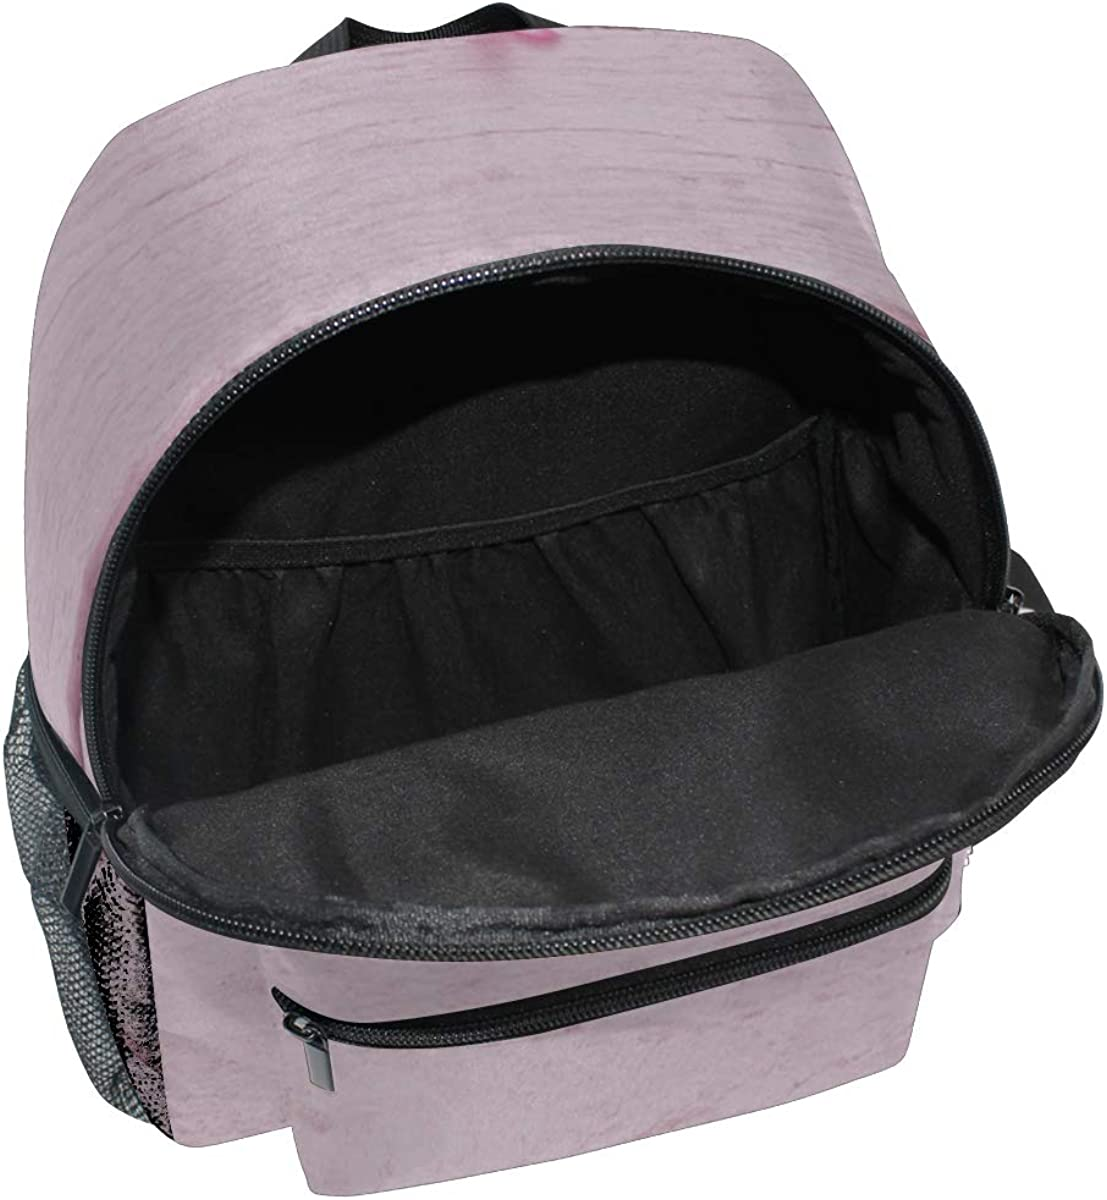 Backpack Cute Kids Backpack Apple Flowers On Pink Wooden Children Bag Toddler Backpack Bookbag School Bag